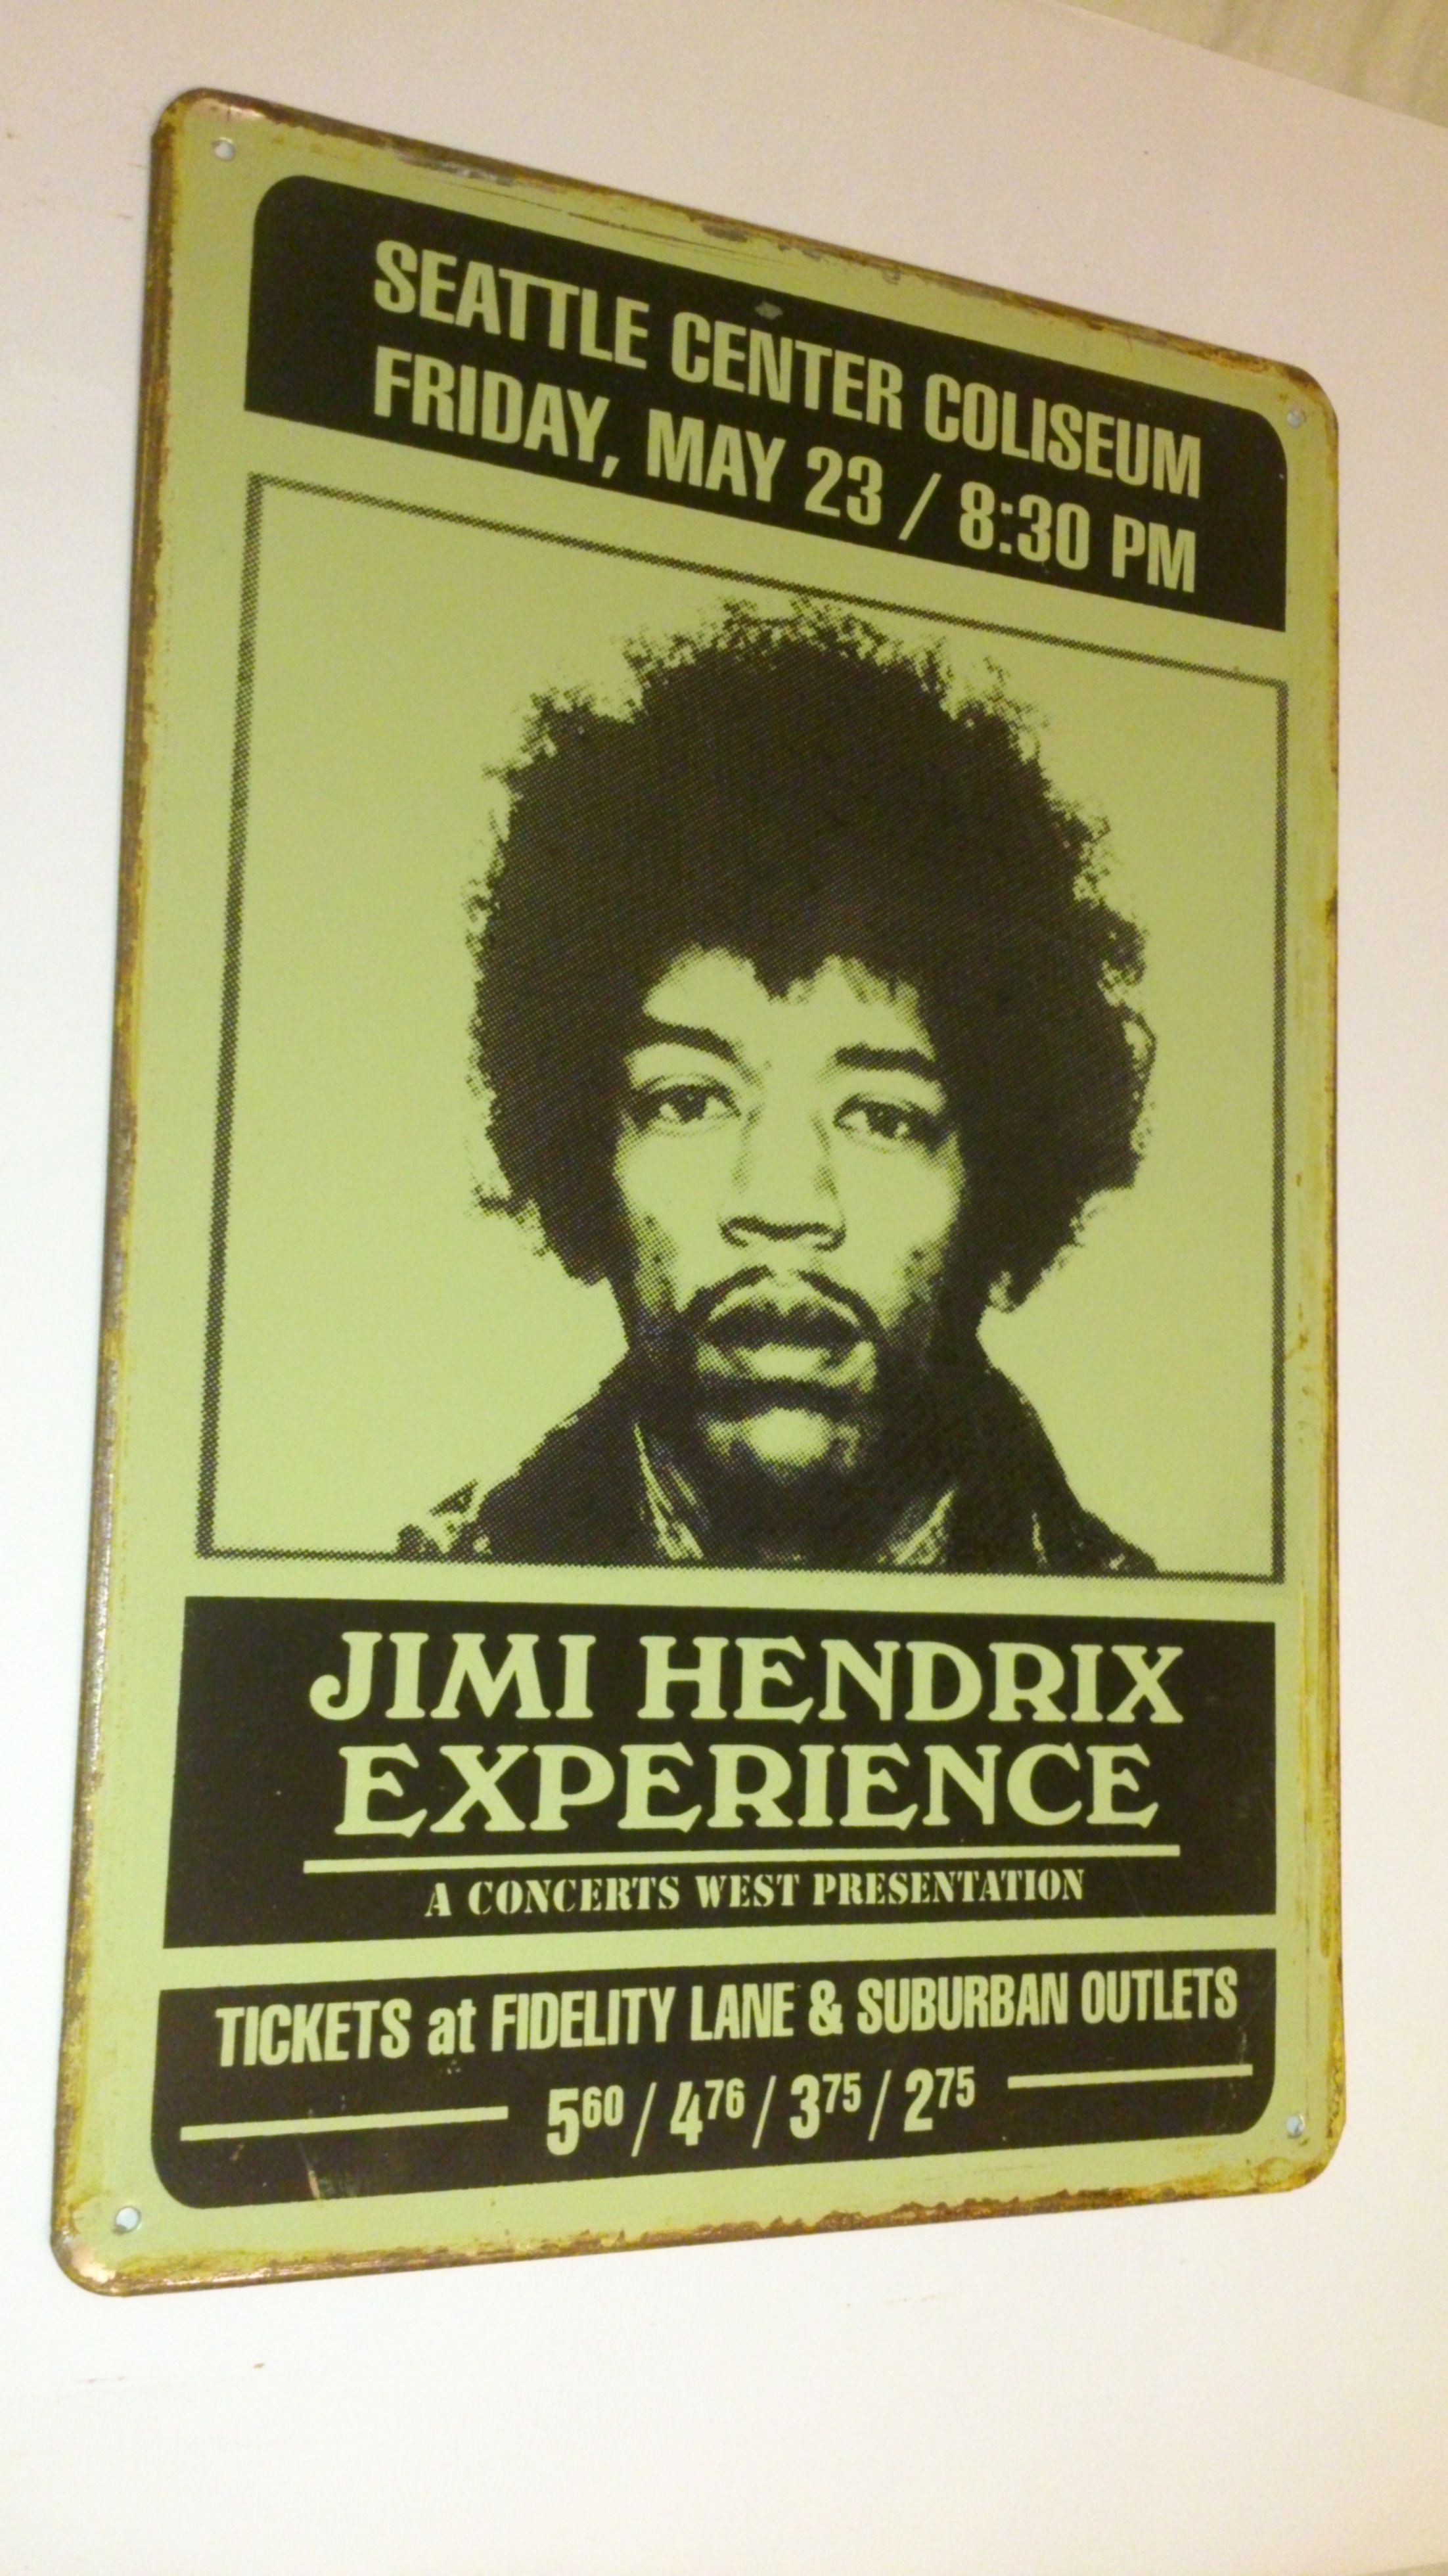 JIMMY HENDRIX EXPERIENCE ジミーヘンドリックス ブリキ看板【ハンドメイド・英国製】